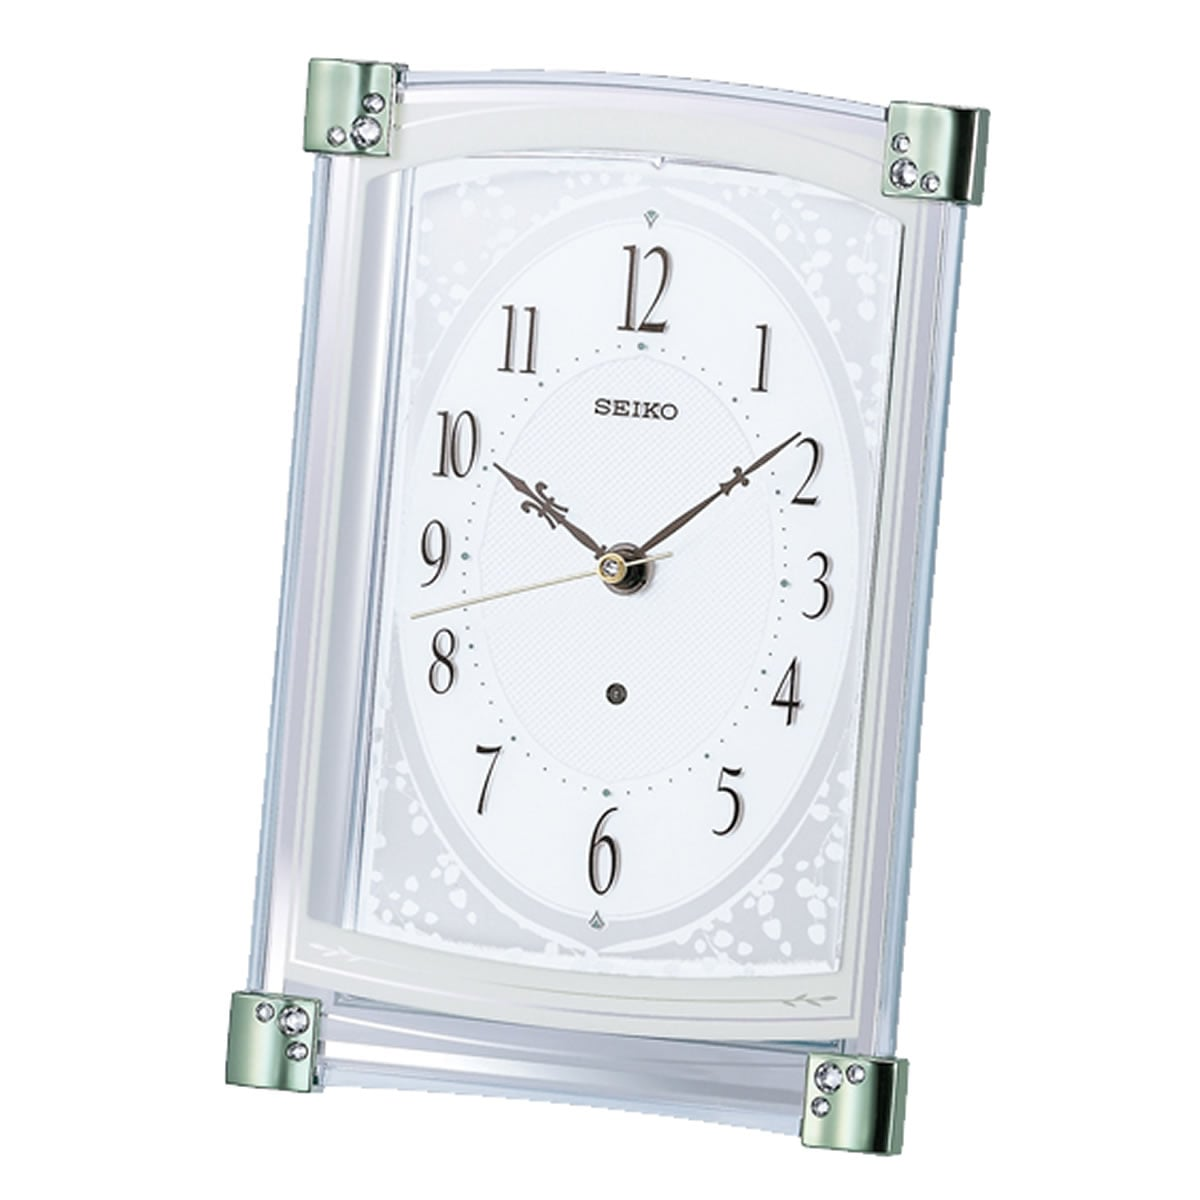 SEIKO セイコー 電波置き時計 BZ360M